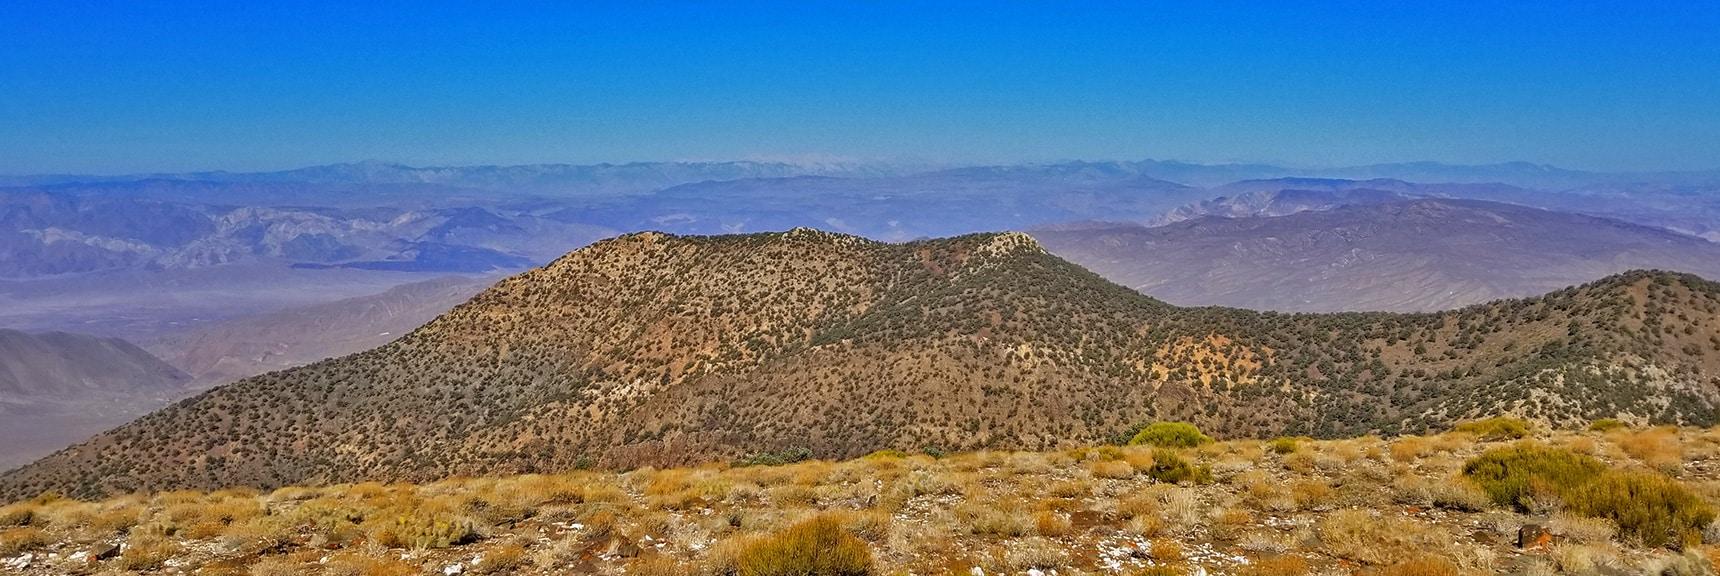 View West Toward Sierra Nevada Mountain Range from Wildrose Peak Summit   Wildrose Peak   Panamint Mountain Range   Death Valley National Park, California